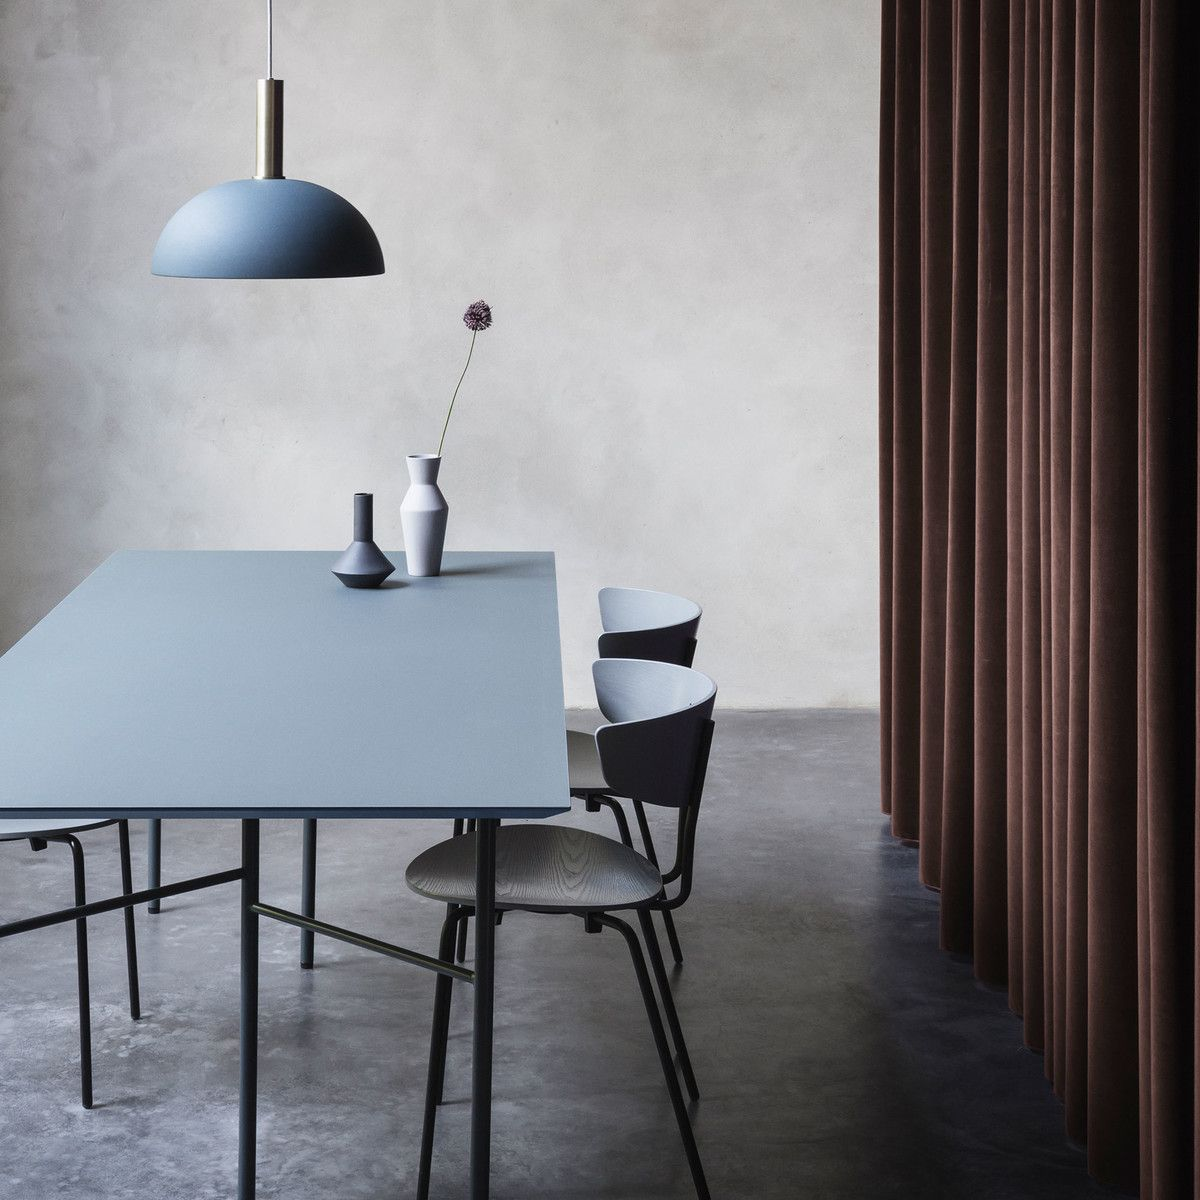 ferm living  mingle table top  furniture  pinterest  kitchen  - ferm living  mingle table top